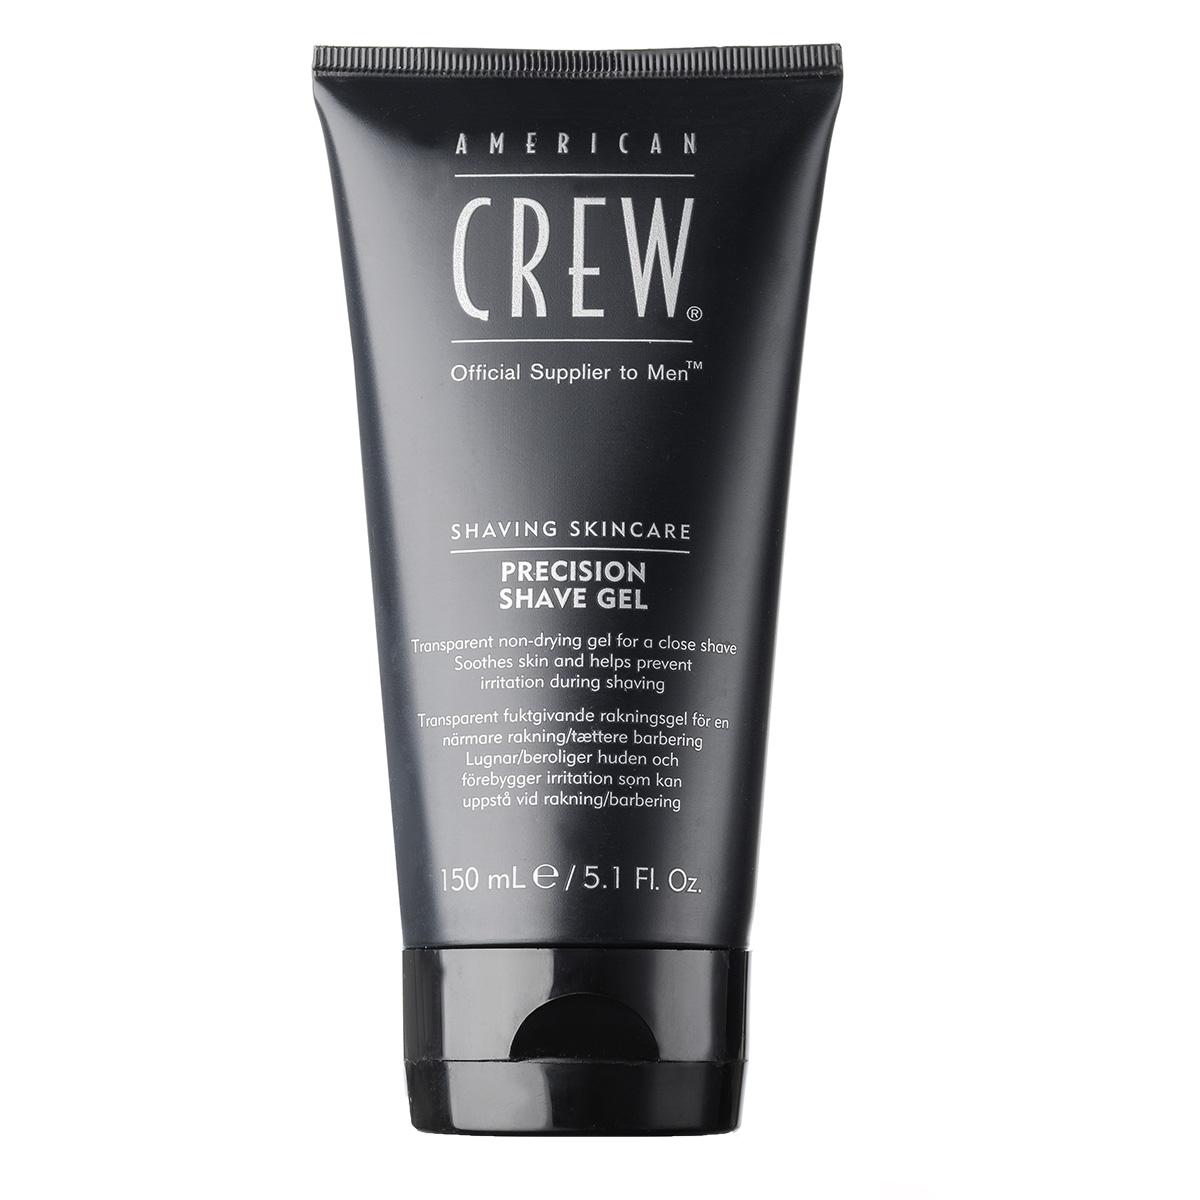 American Crew Shaving Skincare Precision Shave Gel - 150 ml